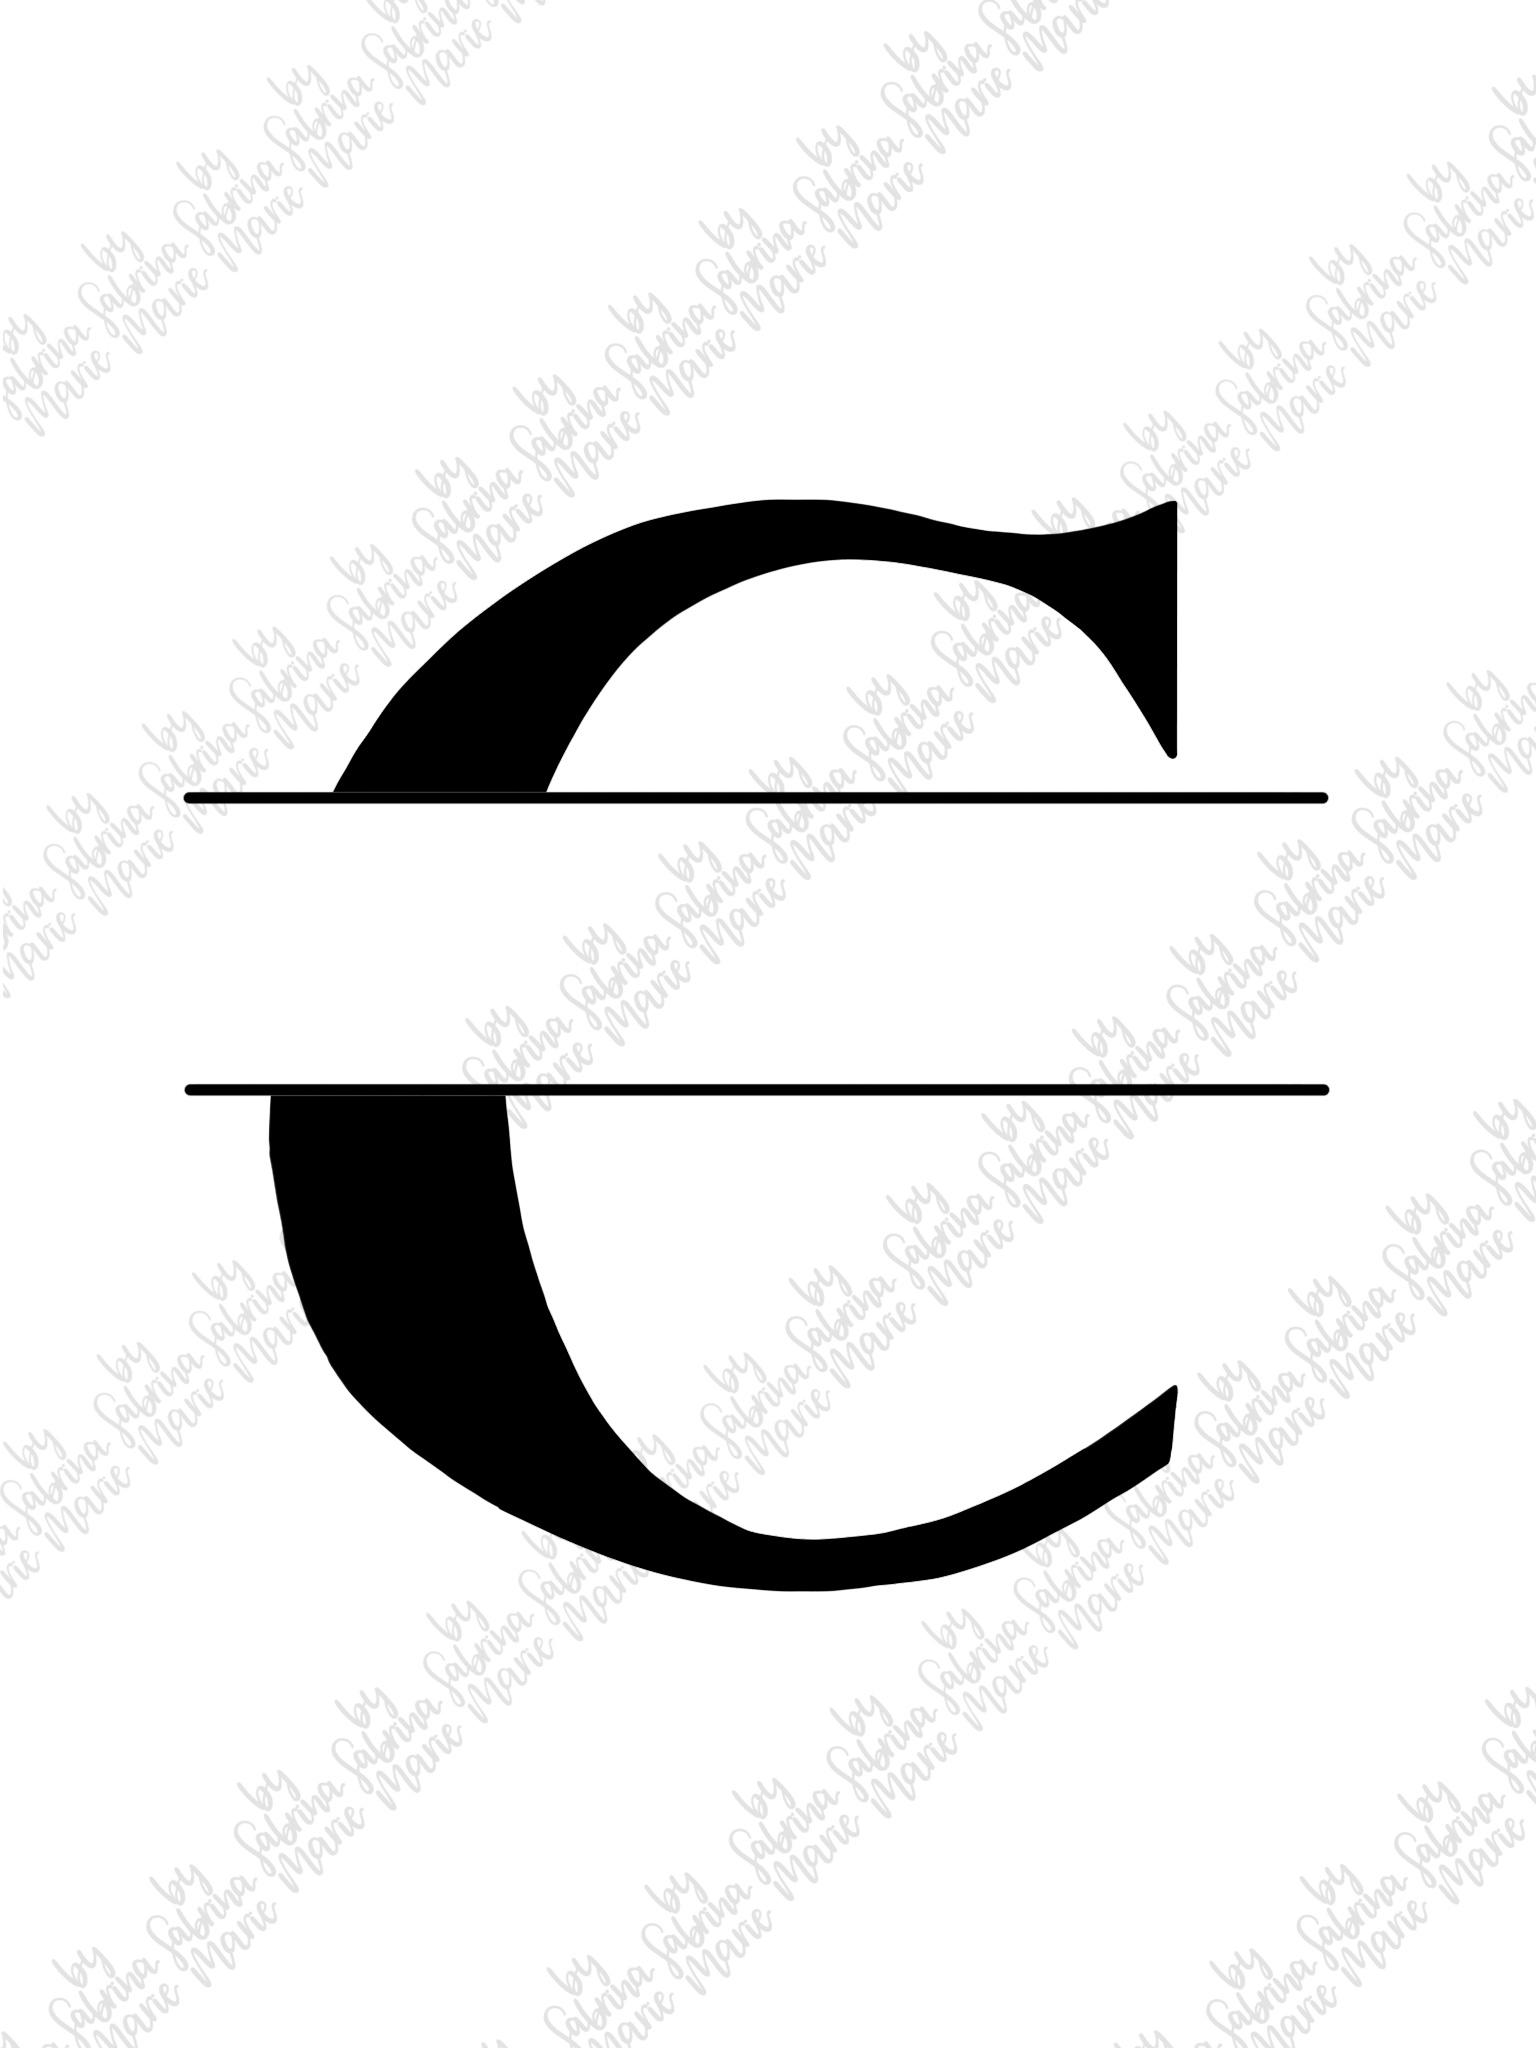 Split Monogram C - Handdrawn - SVG/PNG example image 2